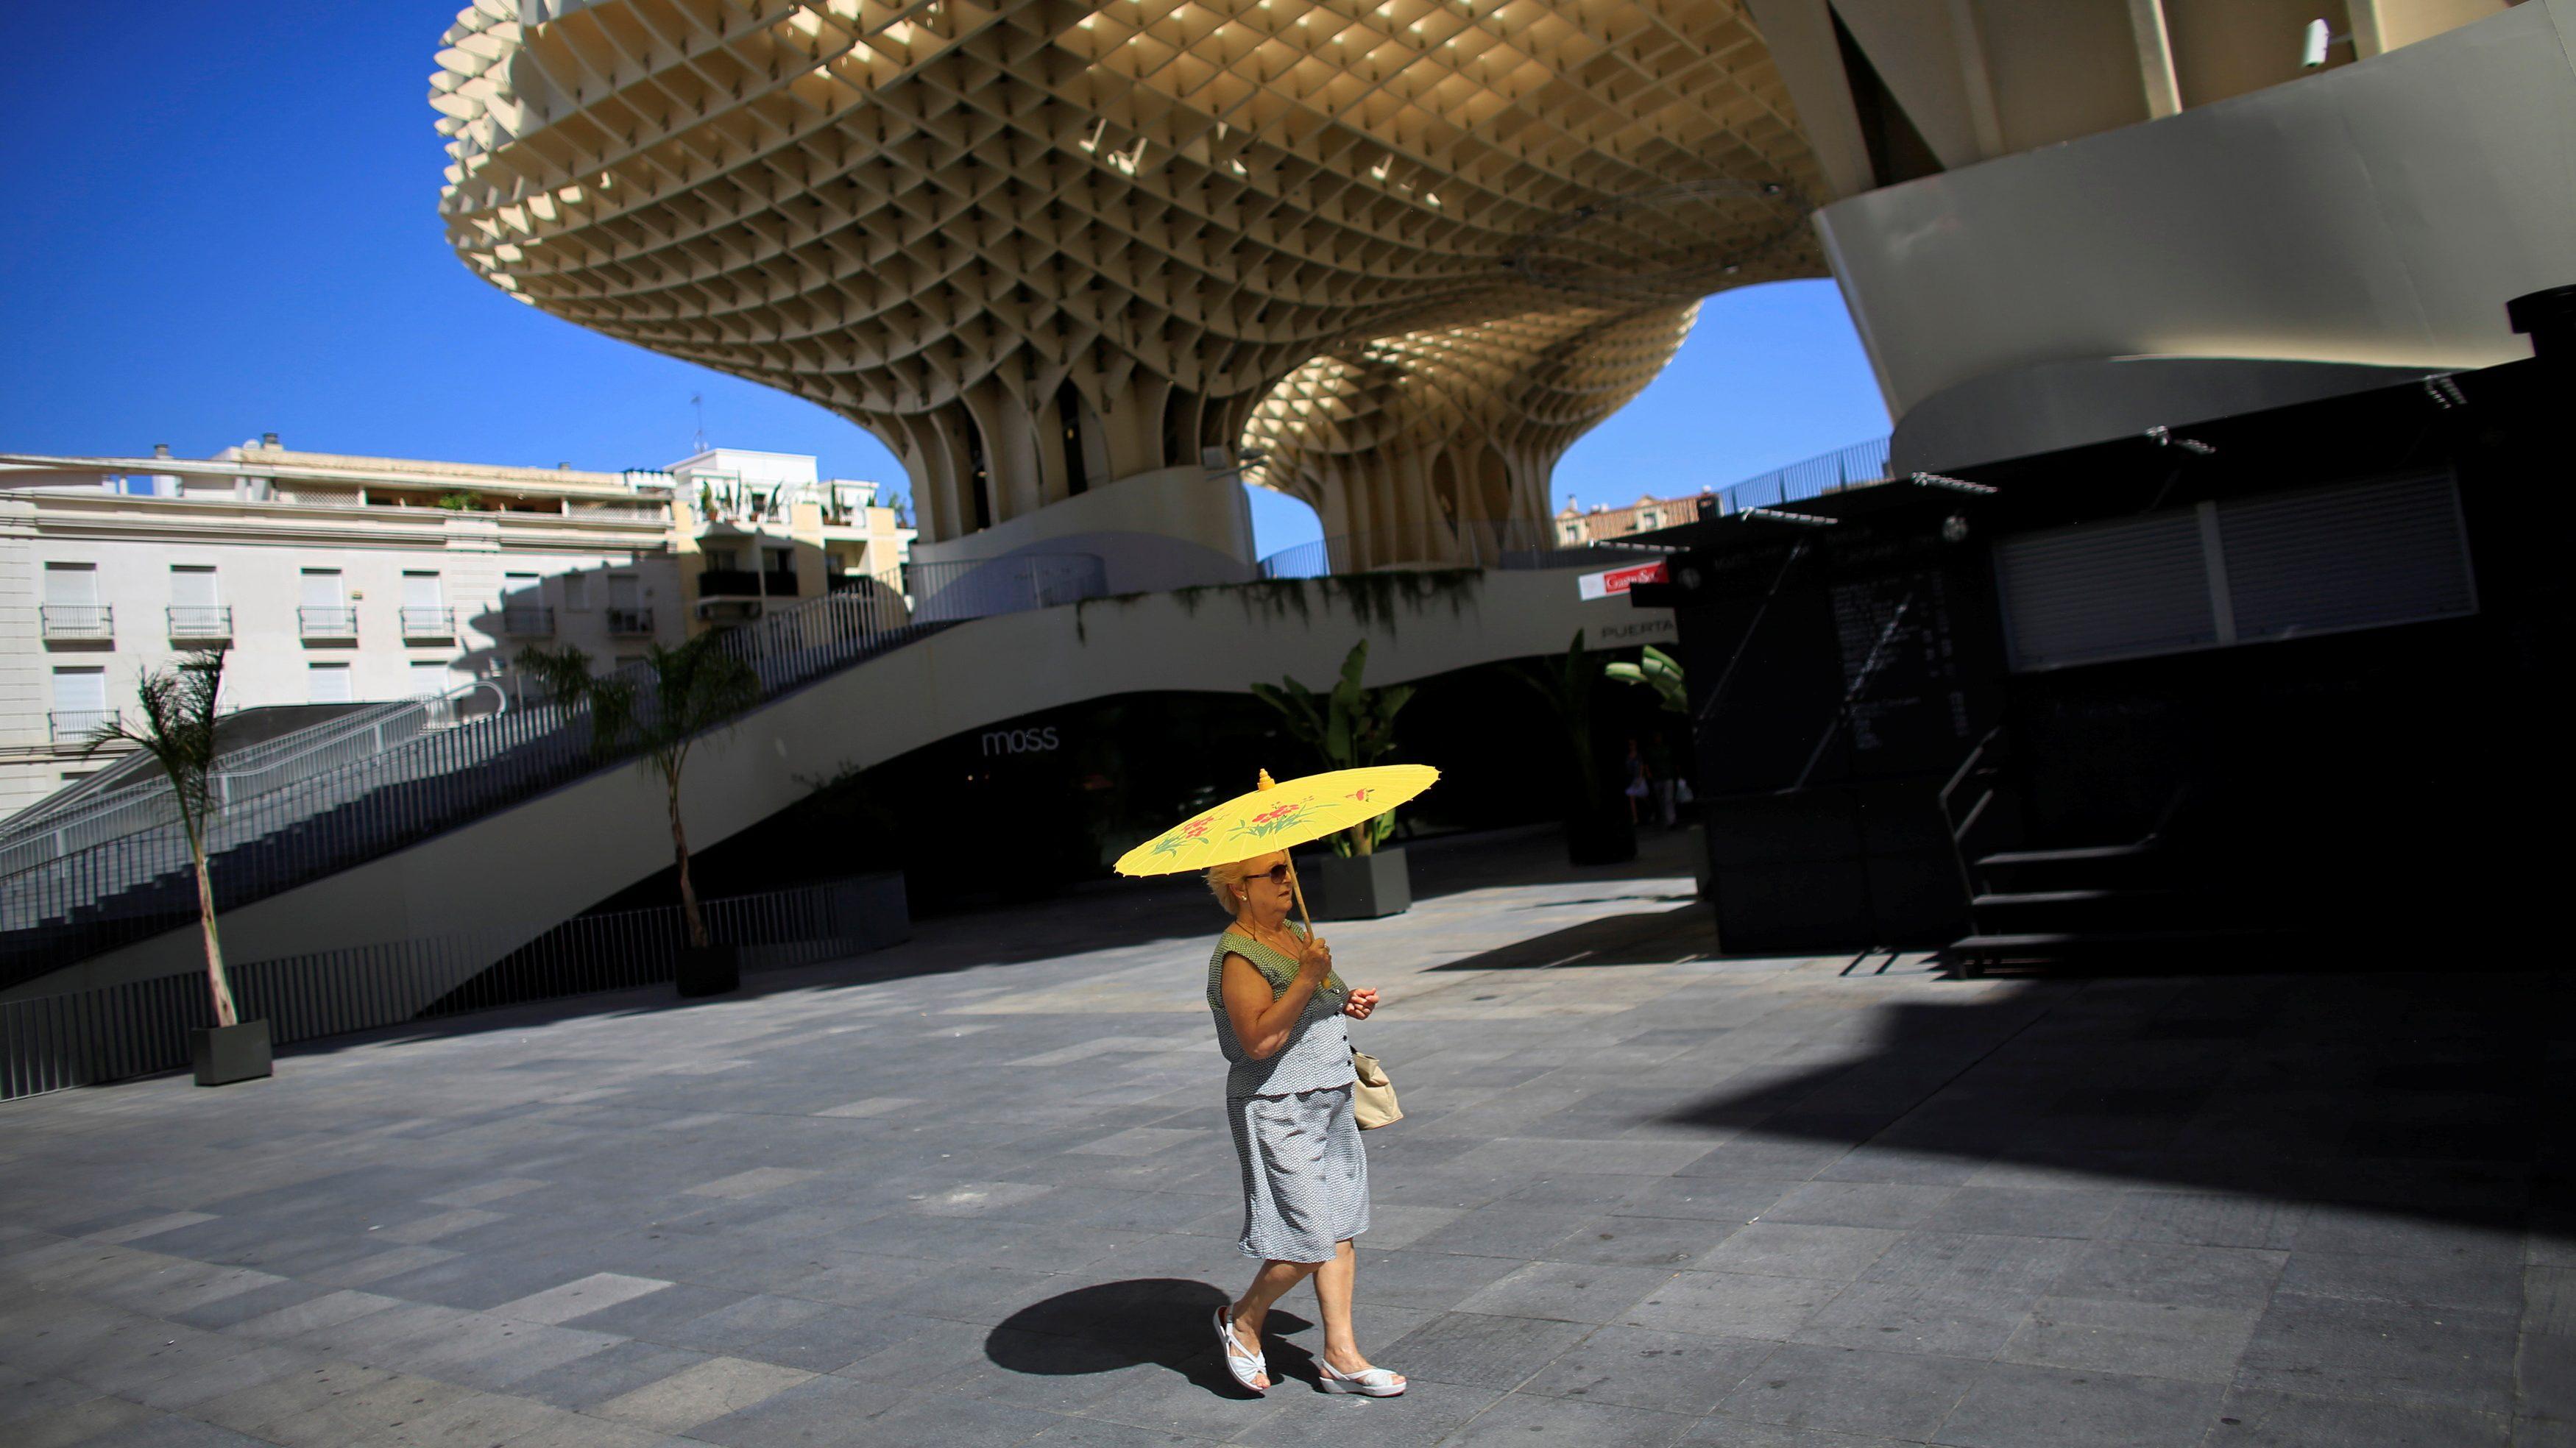 A city in Spain will begin naming heatwaves